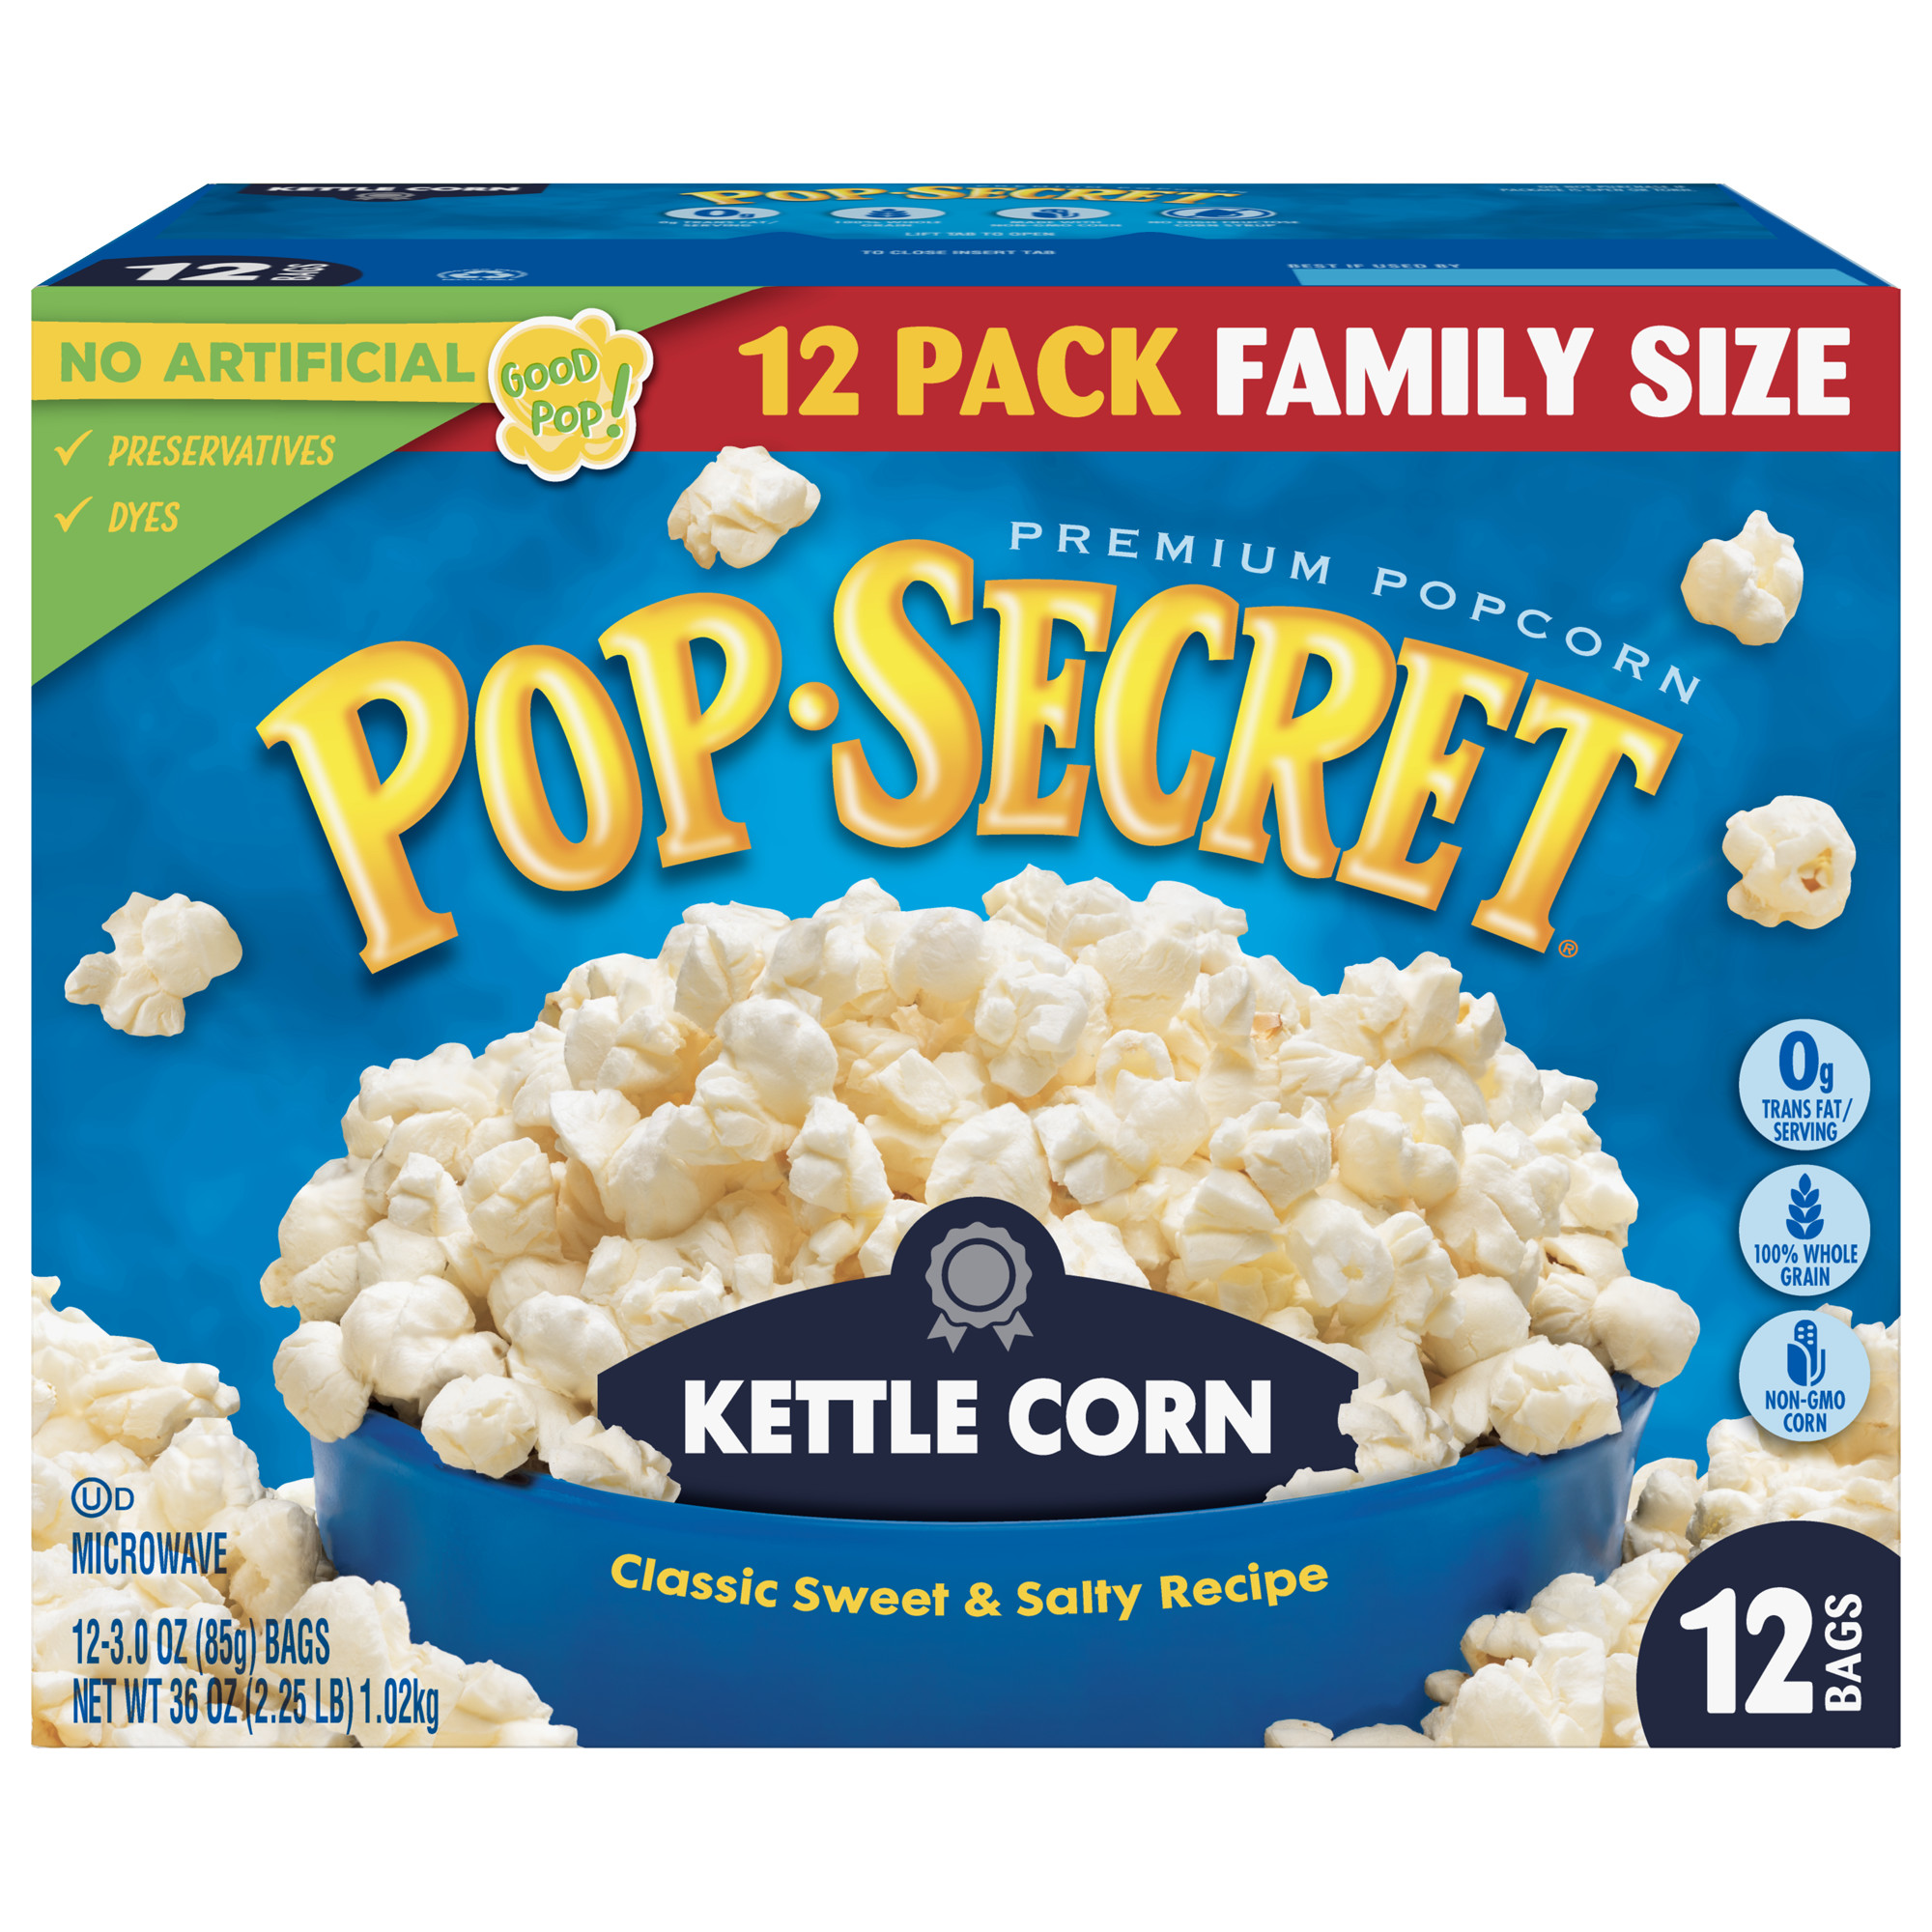 pop secret popcorn kettle corn microwave popcorn 3 oz sharing bags 12 ct